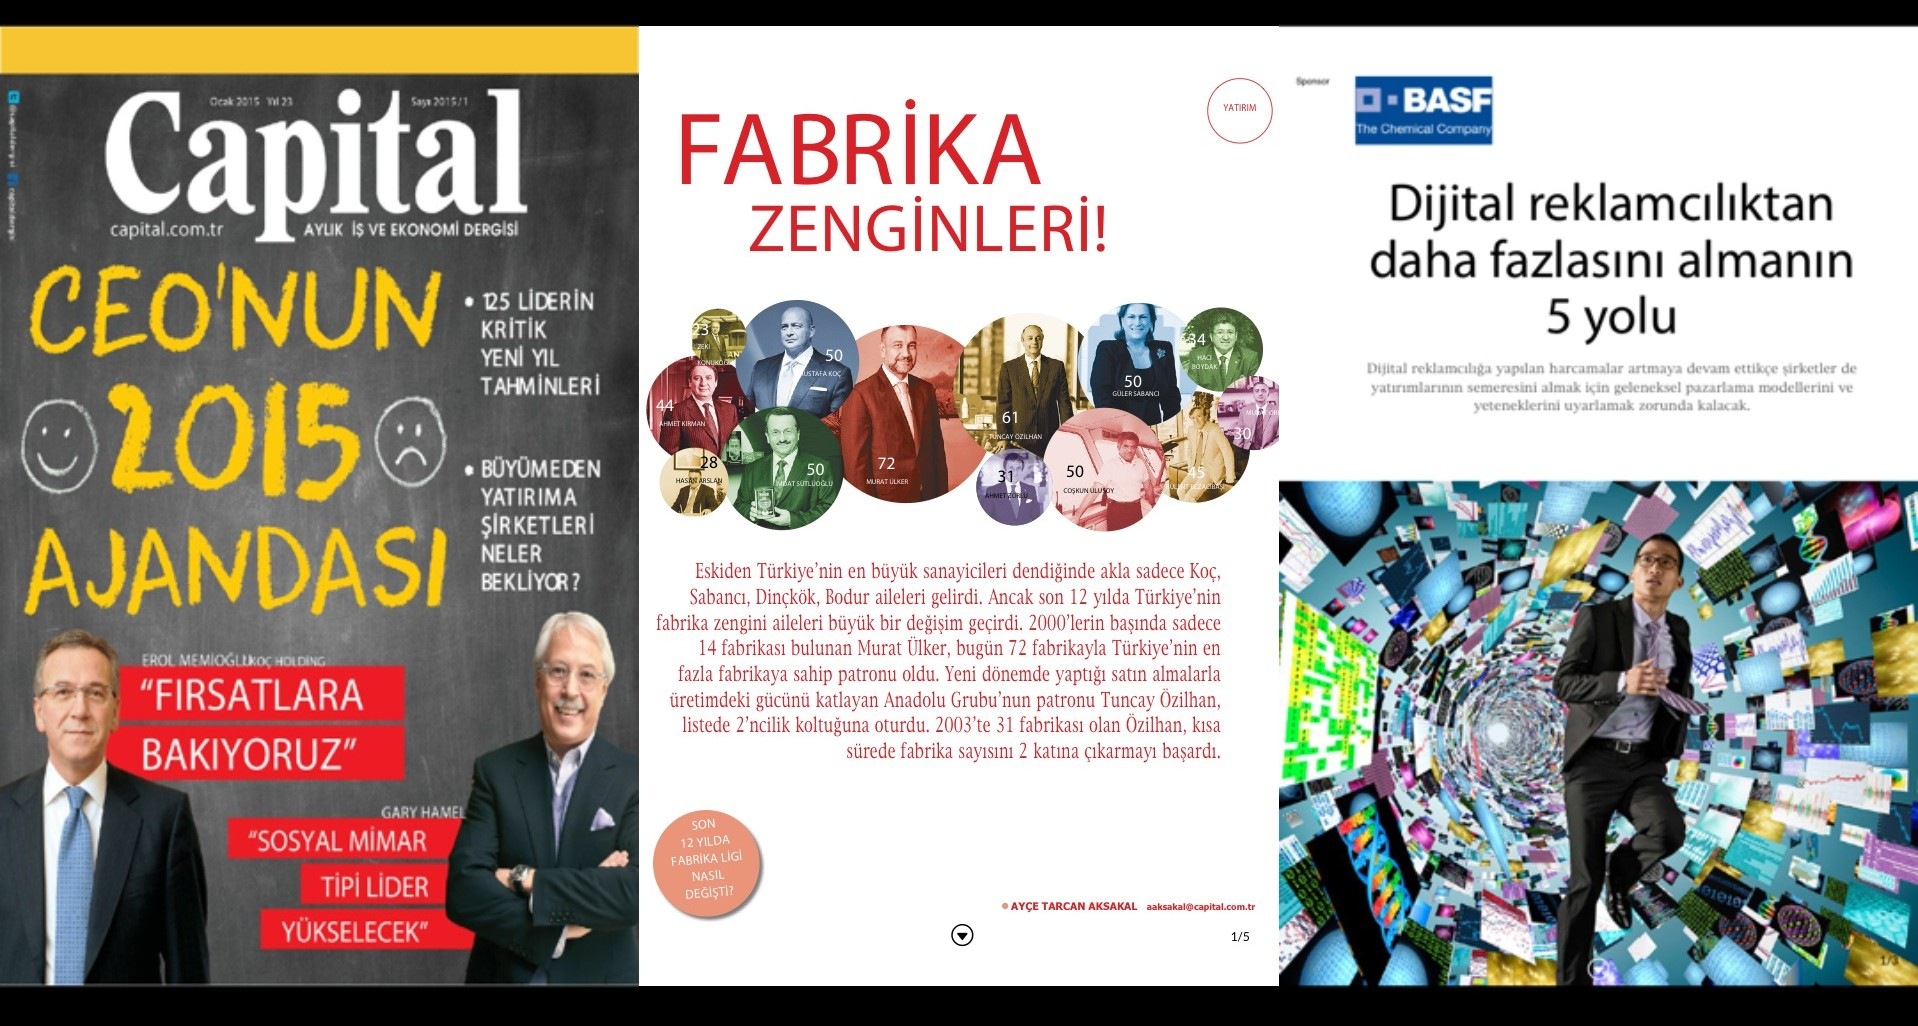 Capital dergisi